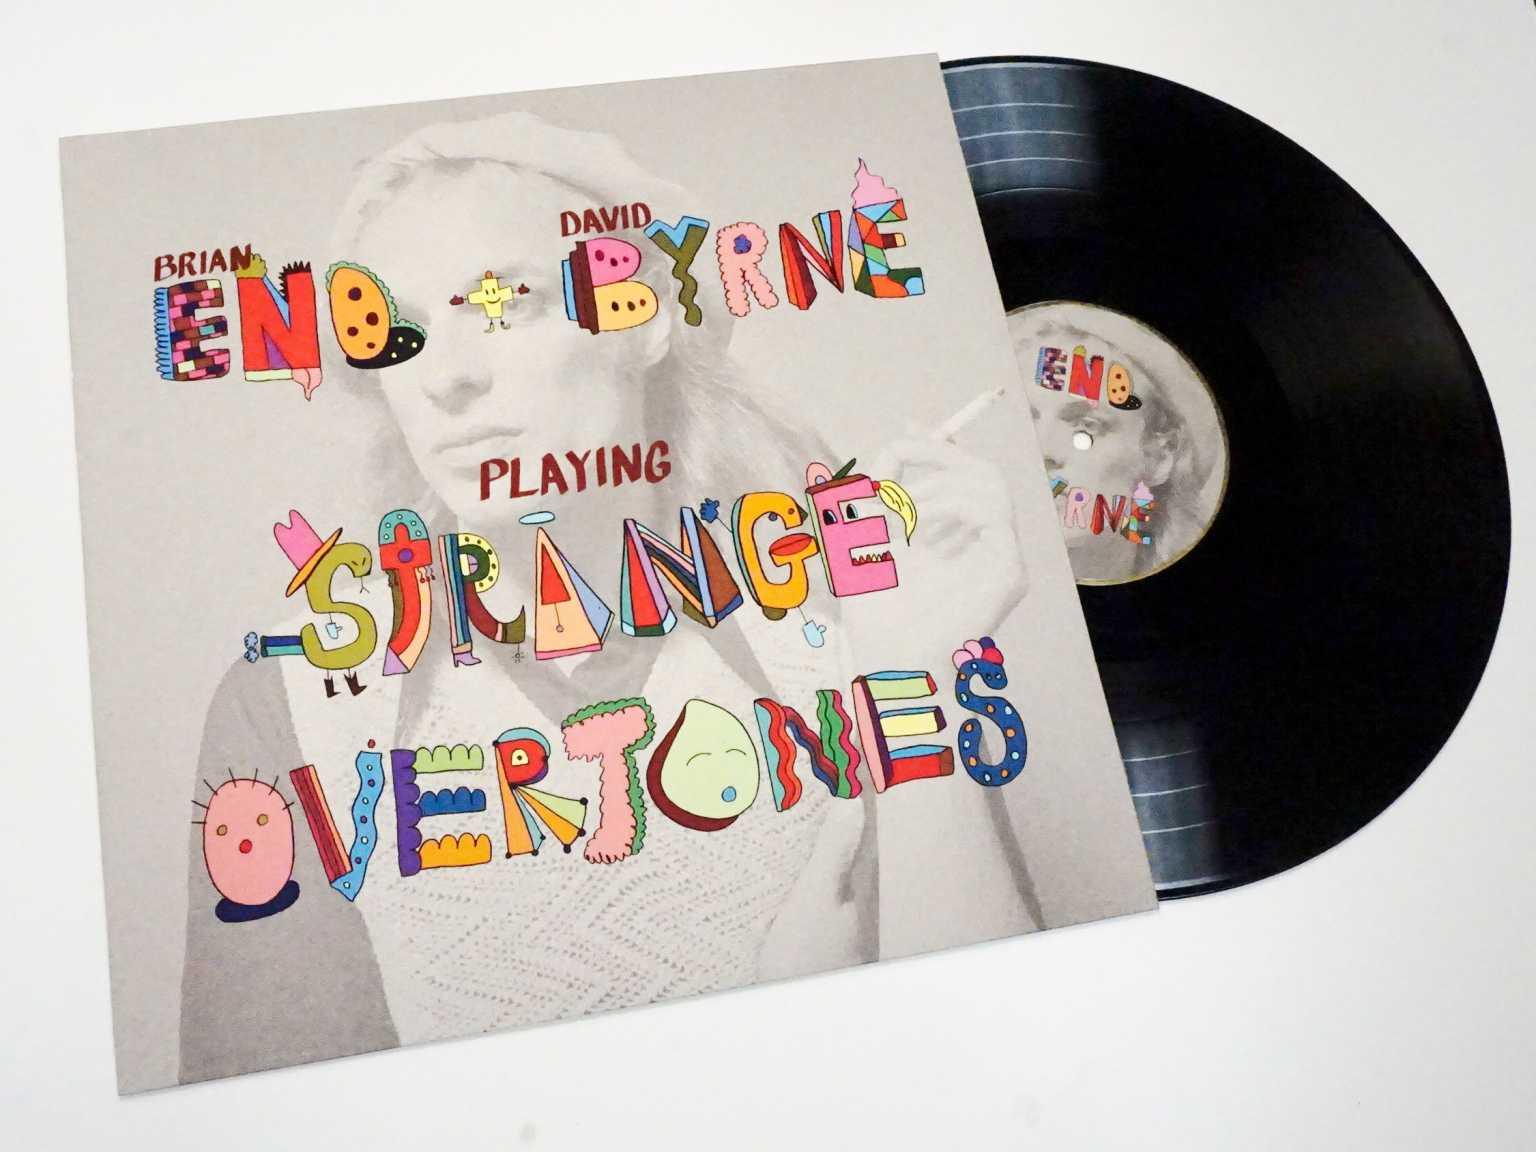 Hand lettered album cover